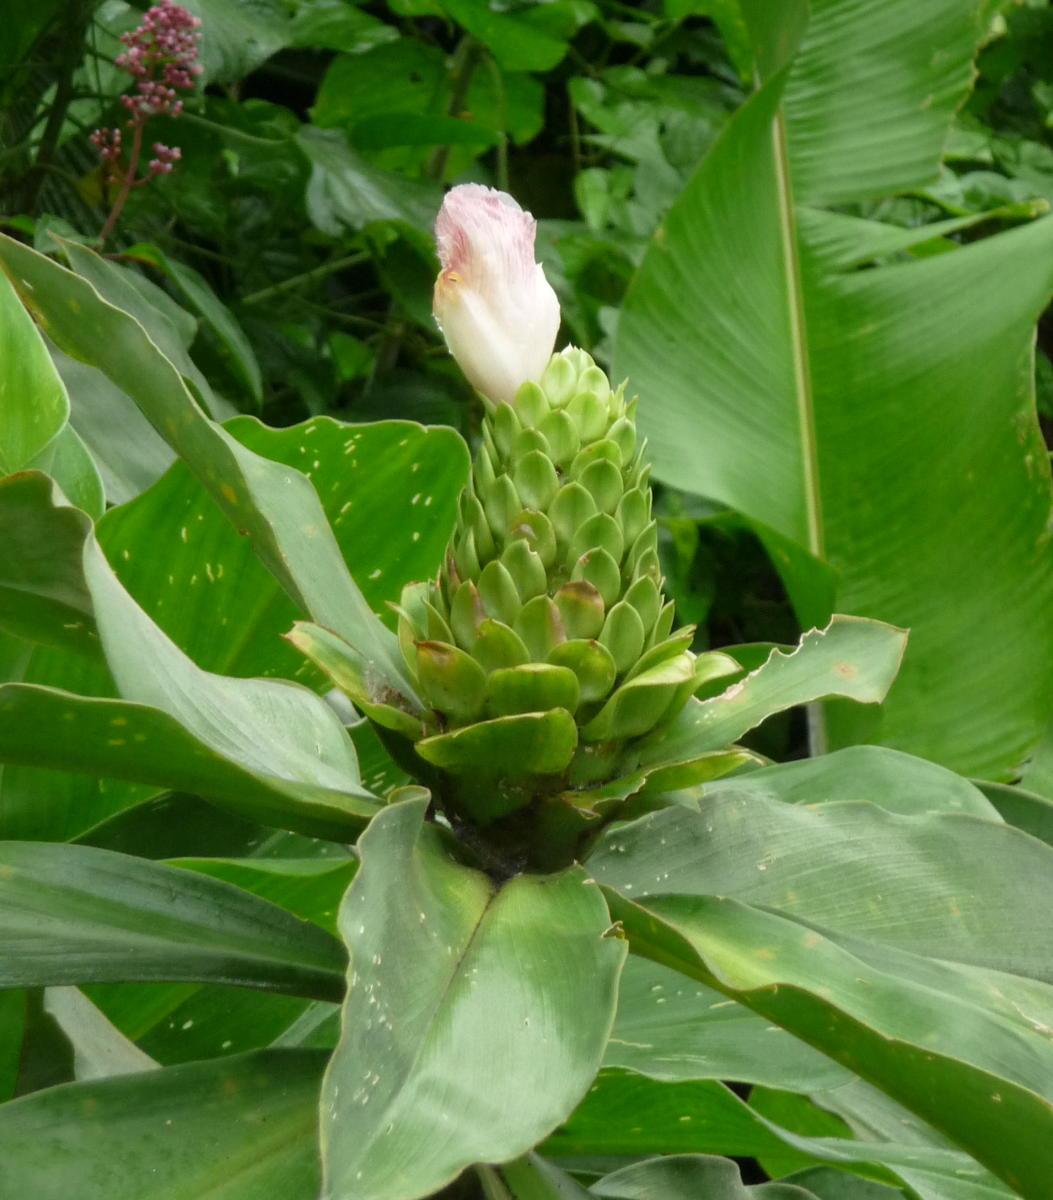 Photo# 16287 - Costus guanaiensis var. guan. from La Fortuna, Panama